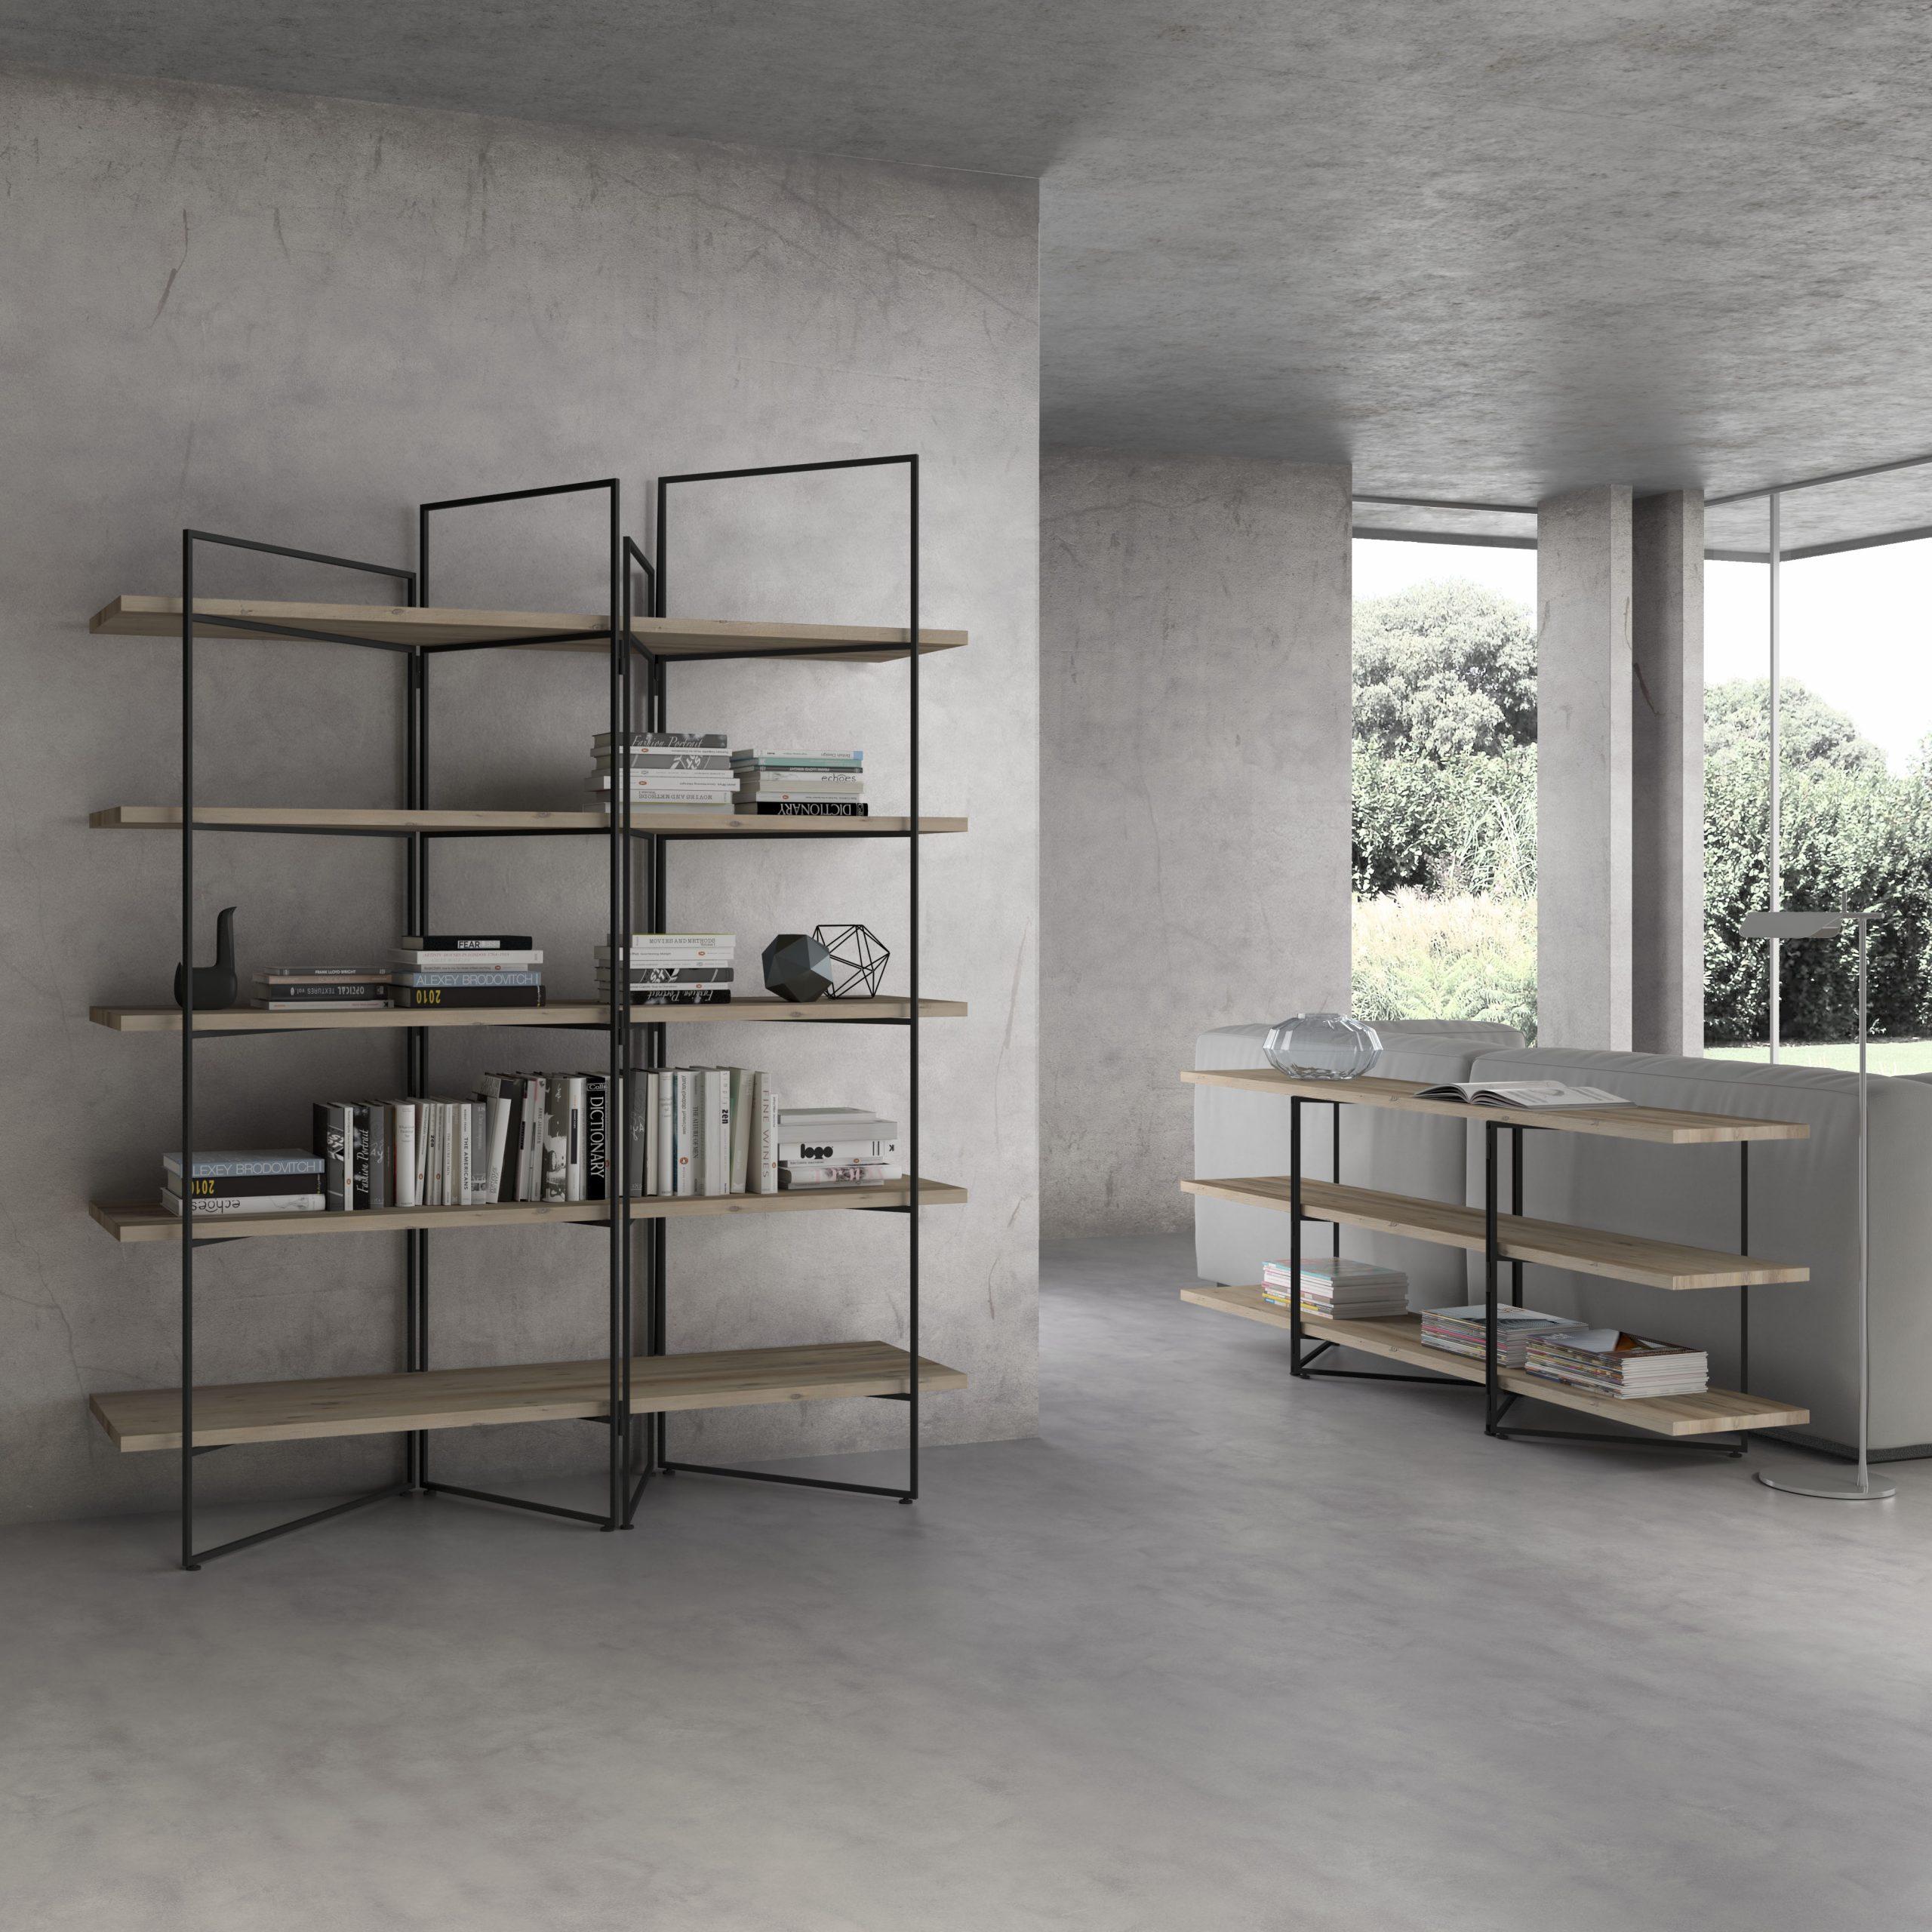 Qualità & Design Eco